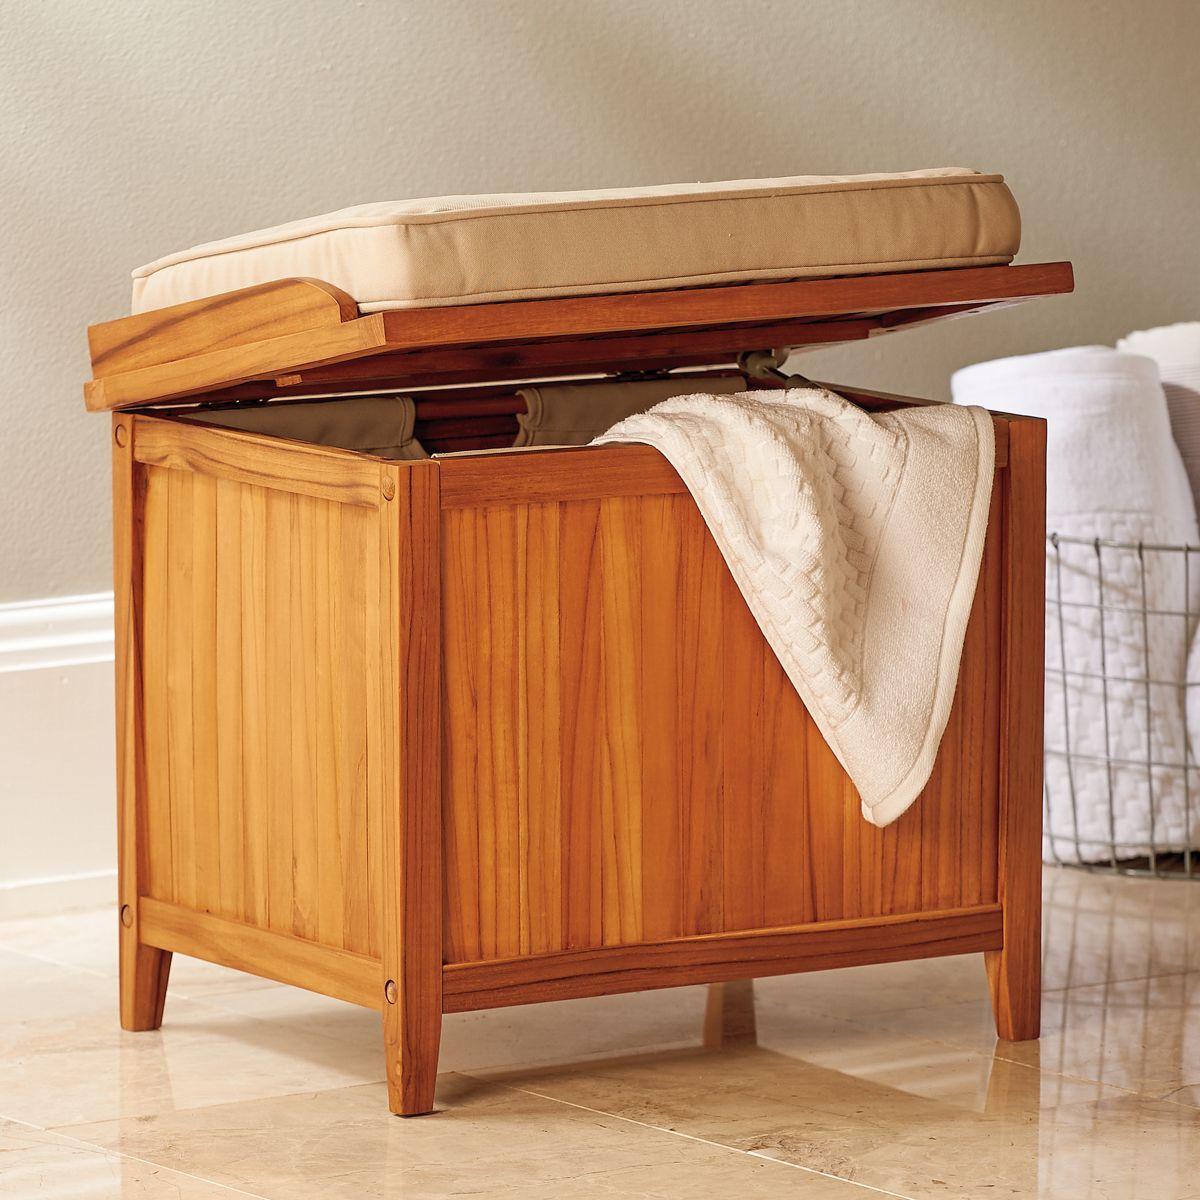 Teak Hamper Bench Storage Bench Seating Bathroom Bench Seat